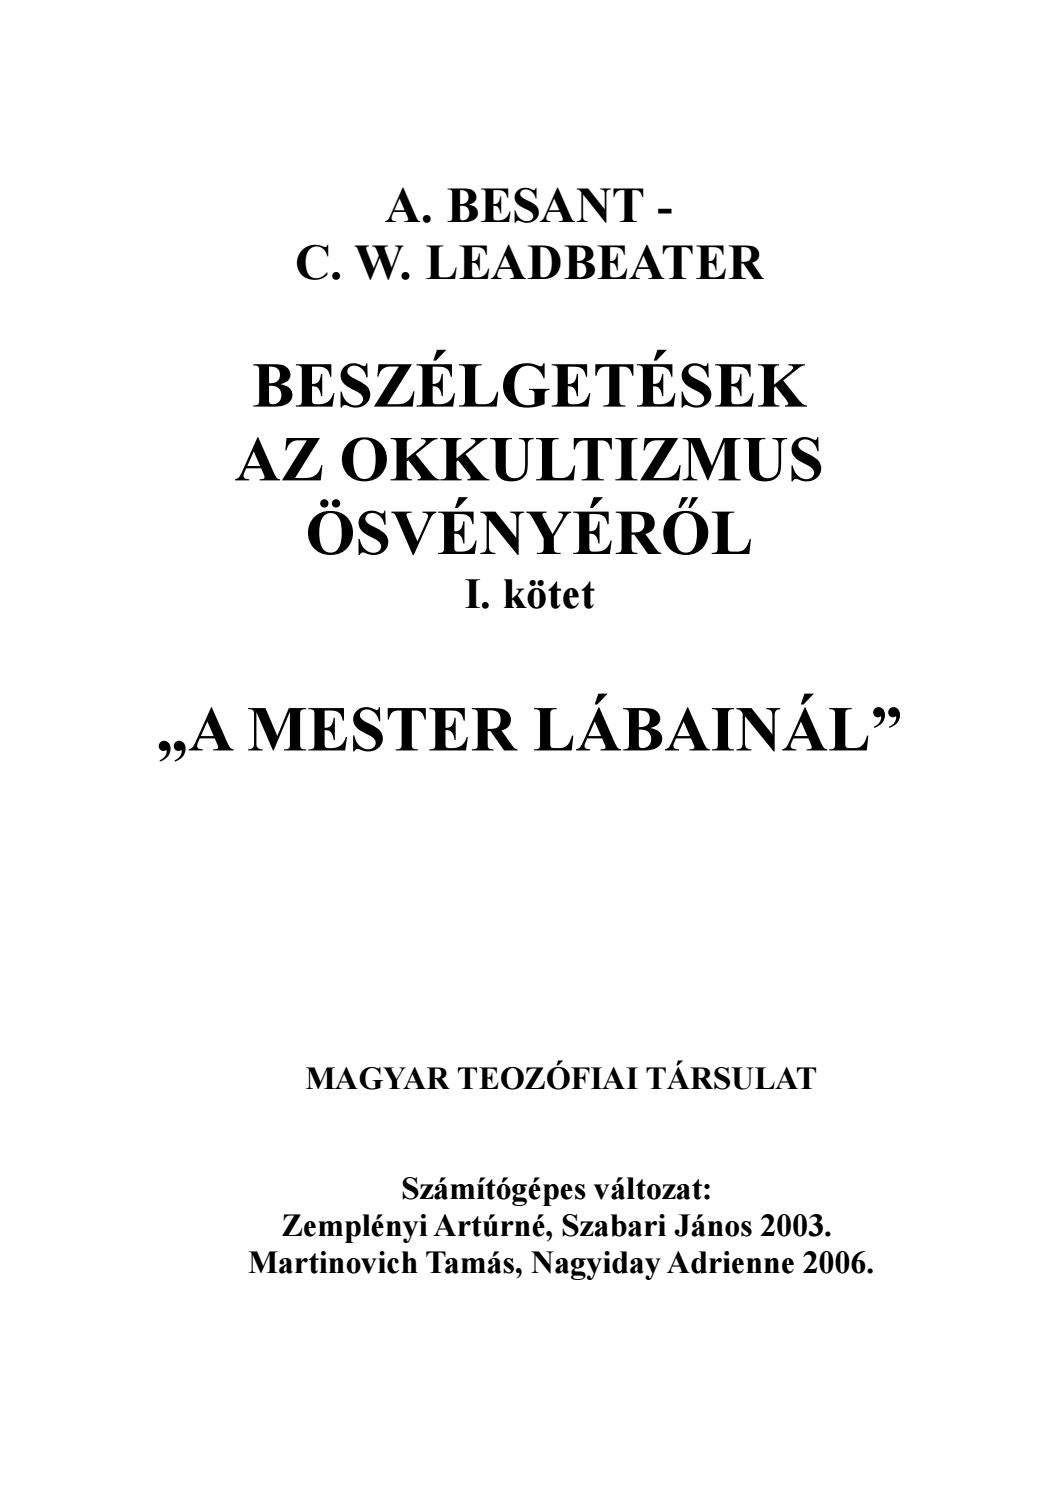 Dr. Török Alexander